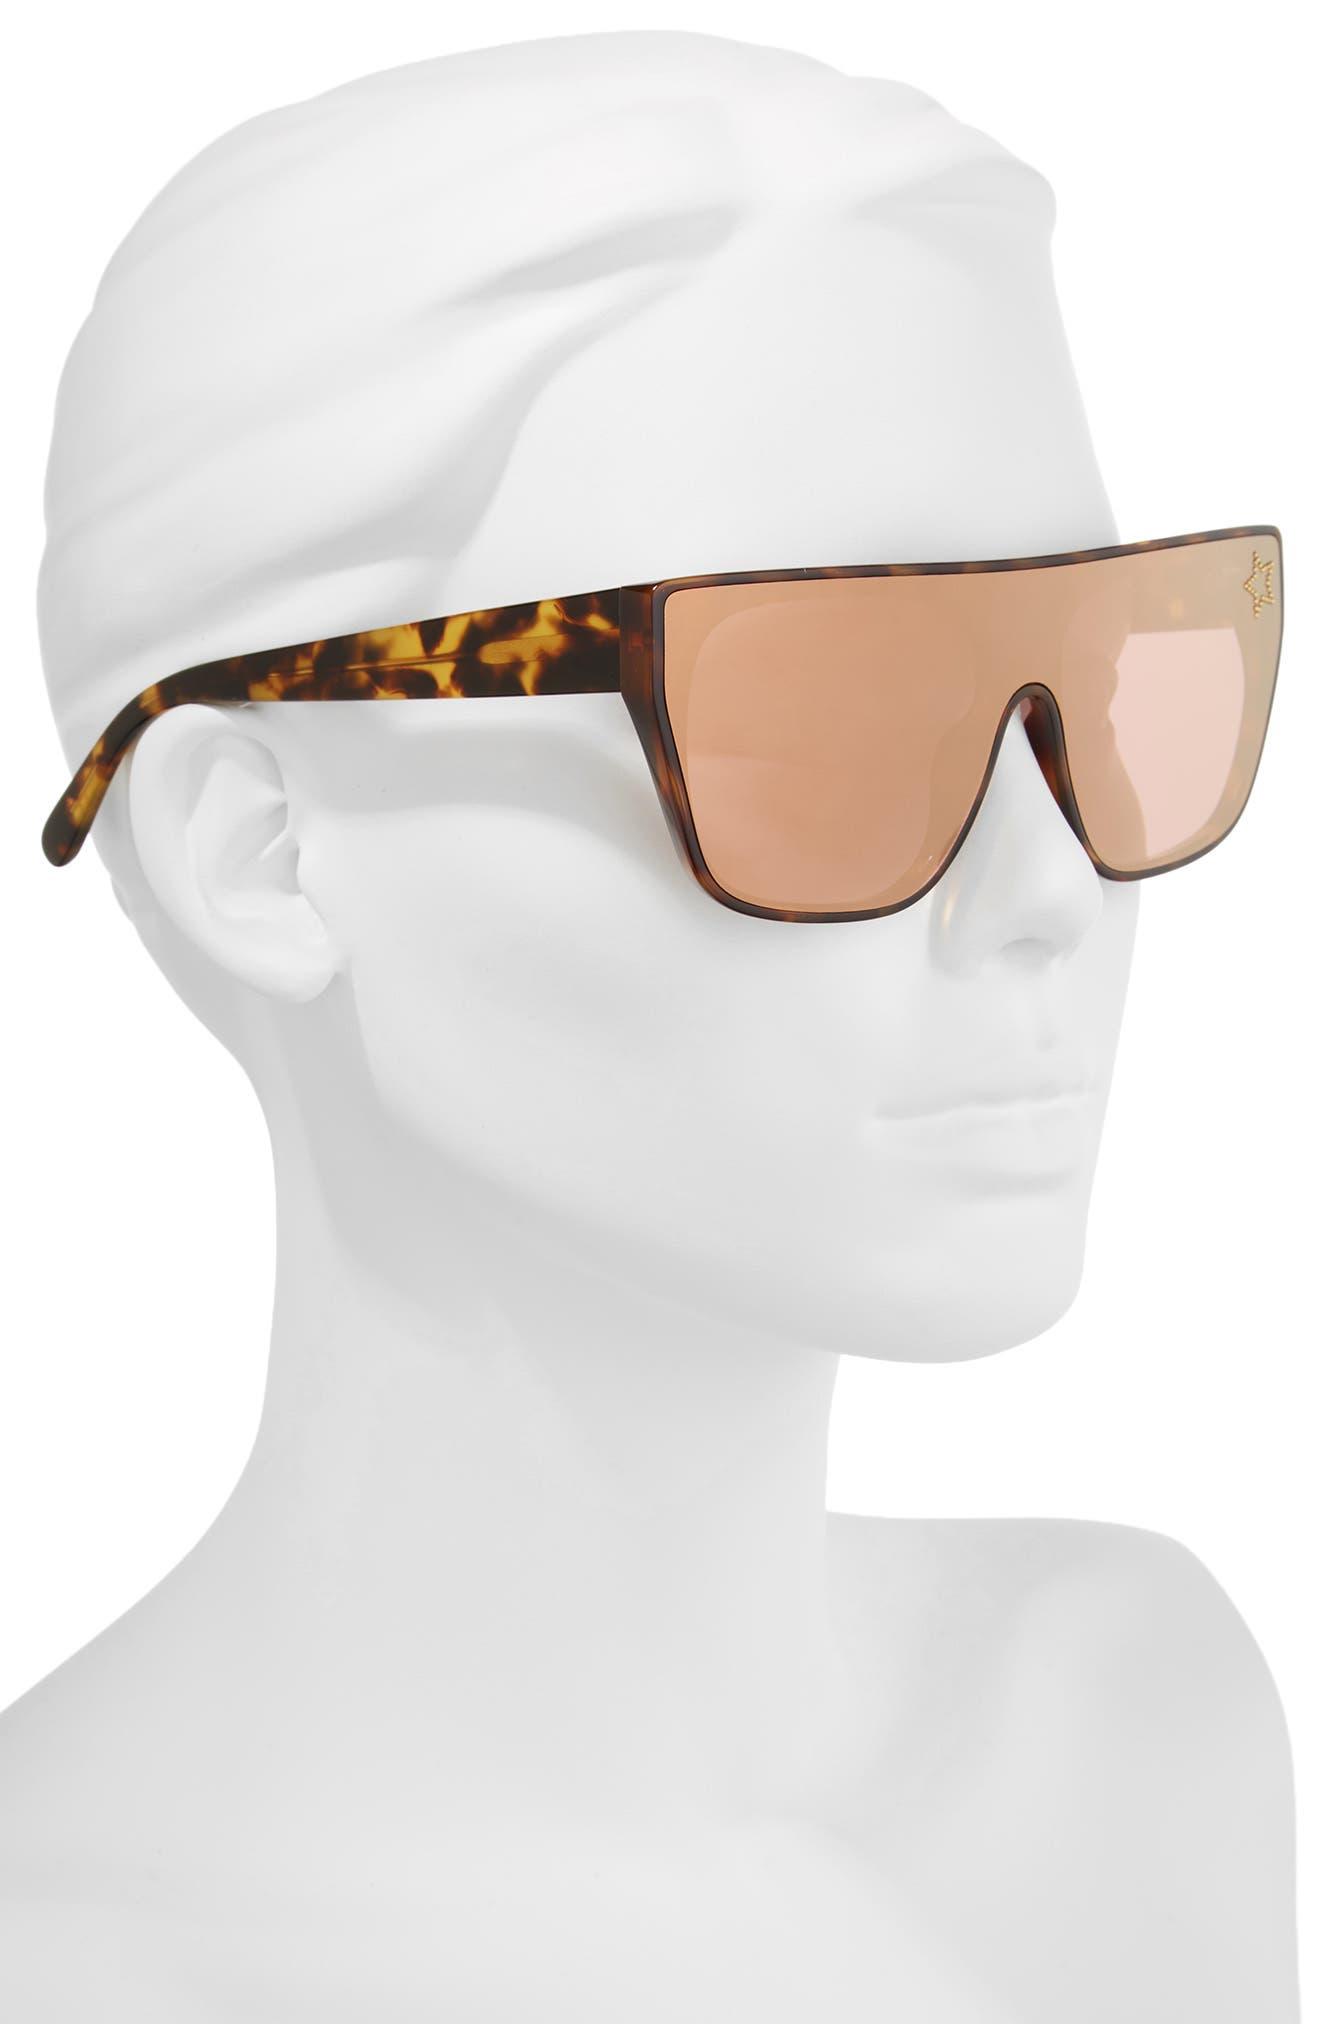 99mm Flat Top Sunglasses,                             Alternate thumbnail 2, color,                             Blonde Avana